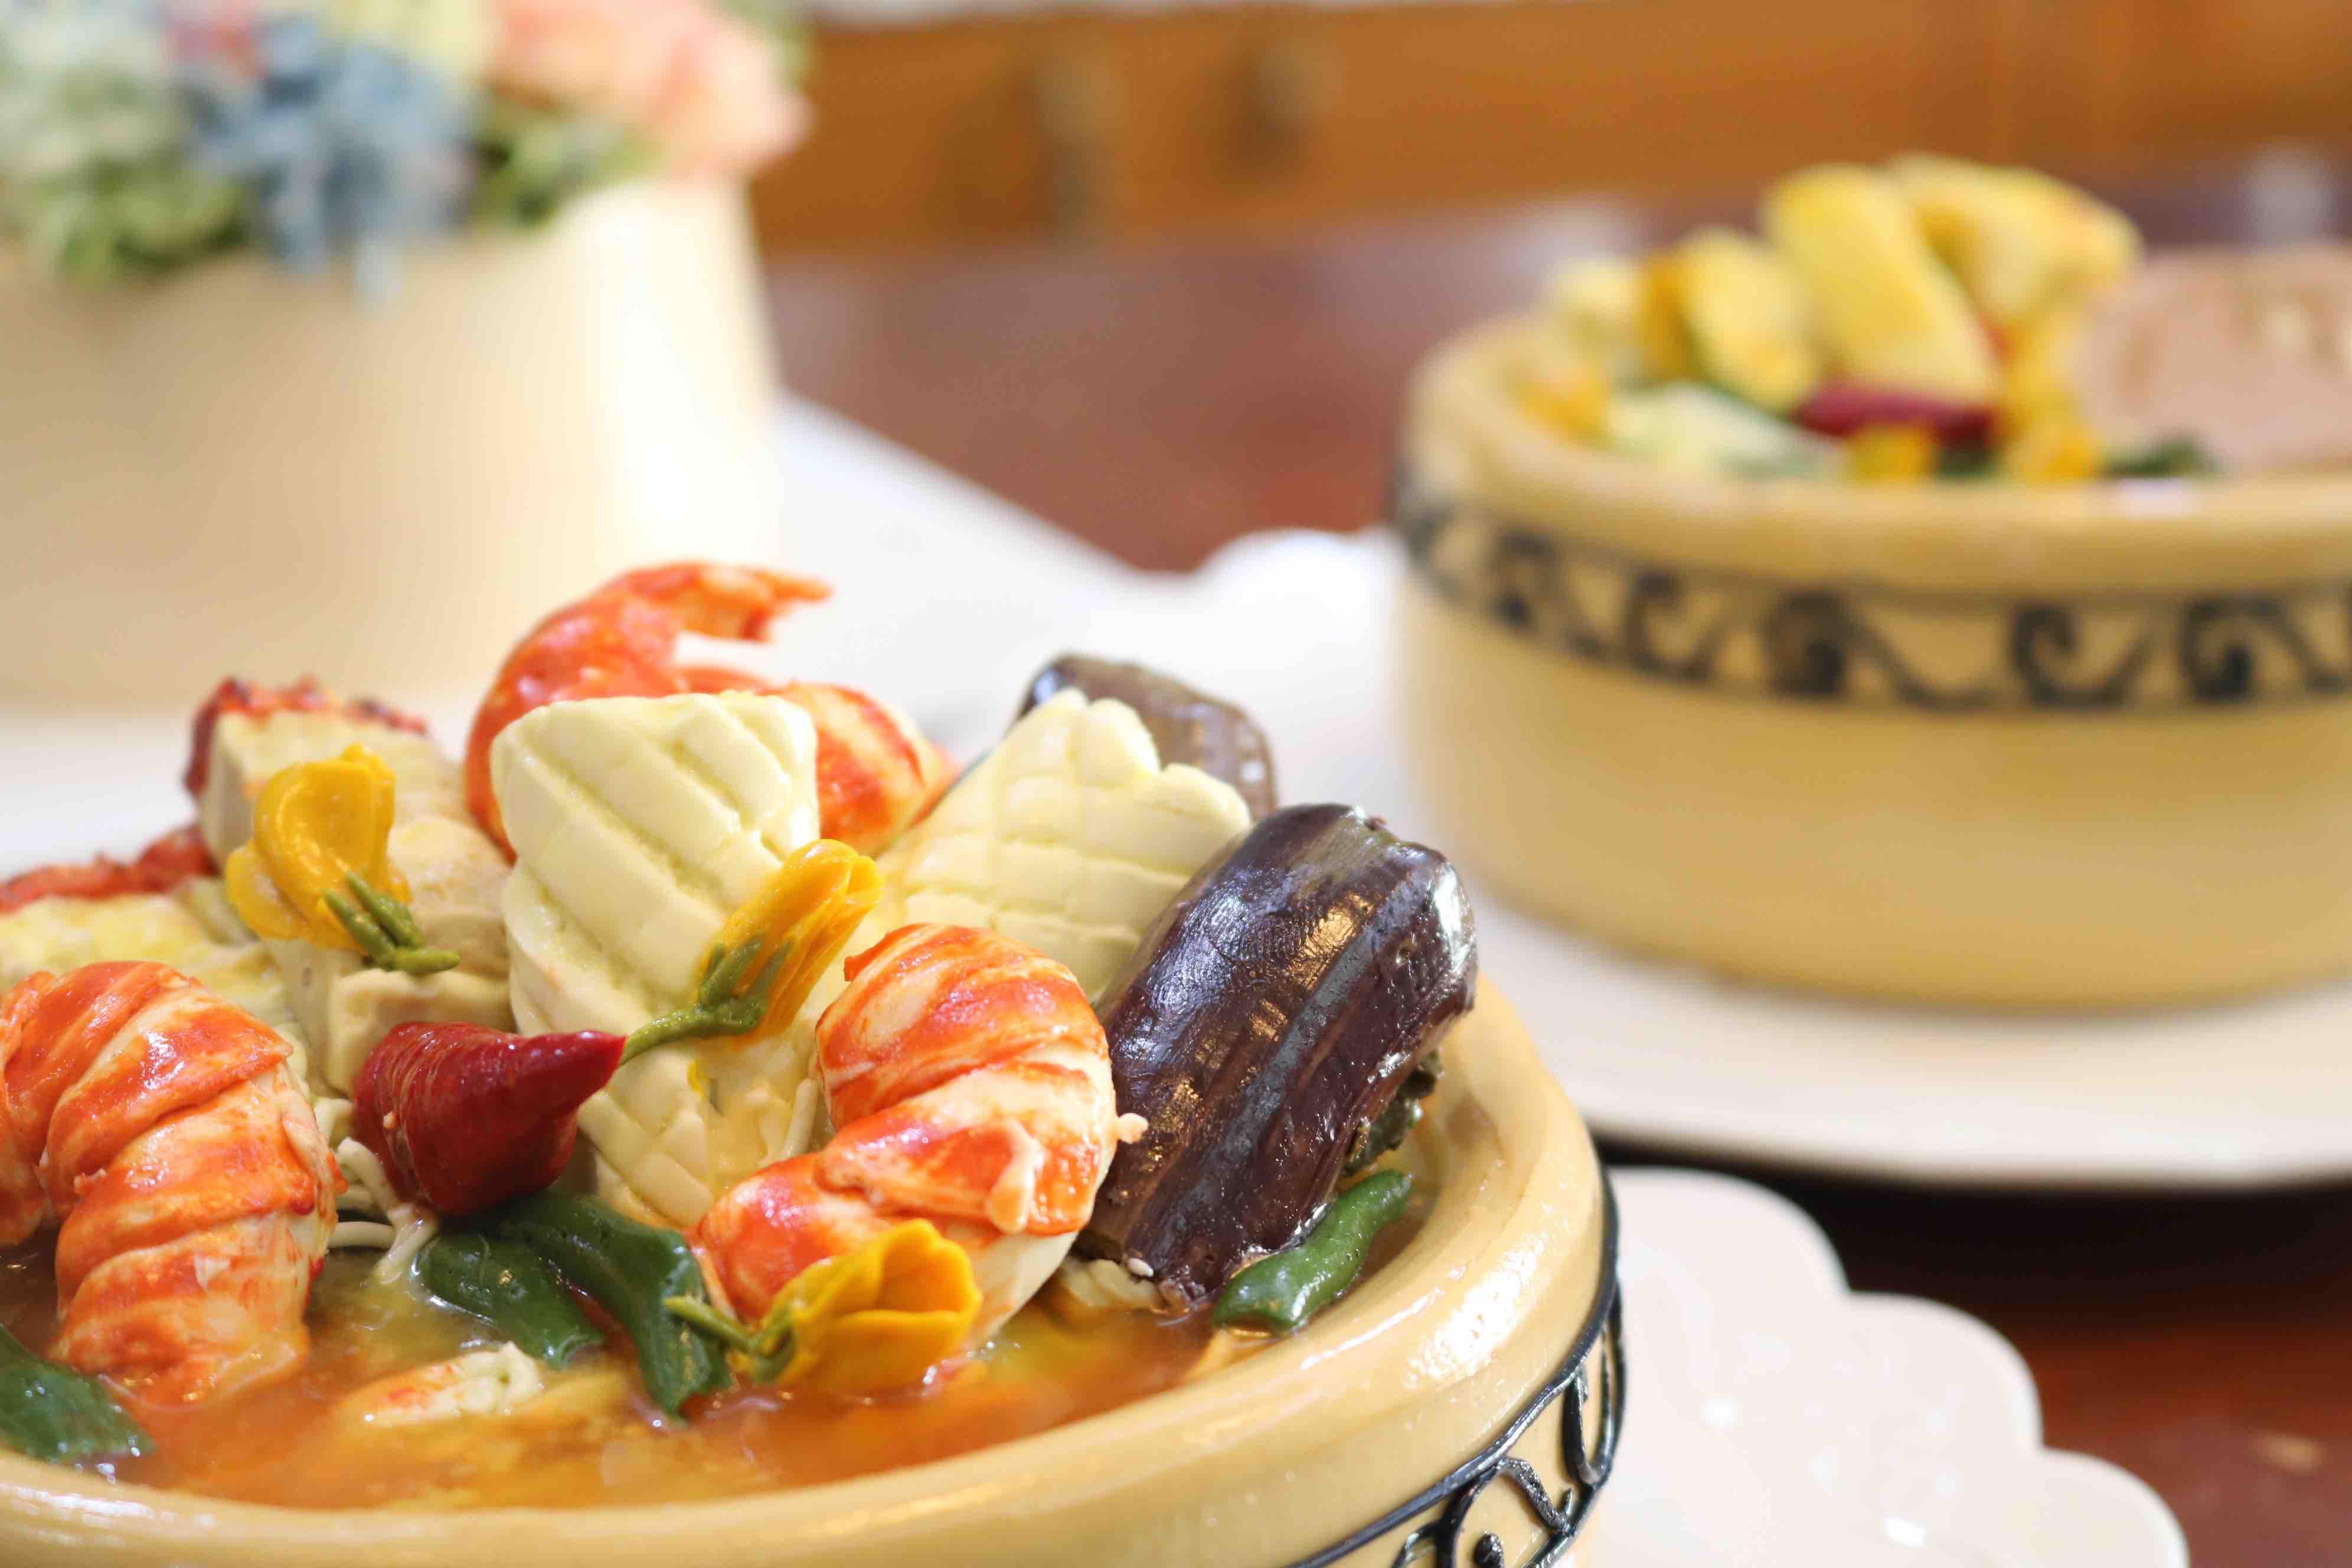 Meet the Vietnamese baker putting Vietnam's cake scene on the map